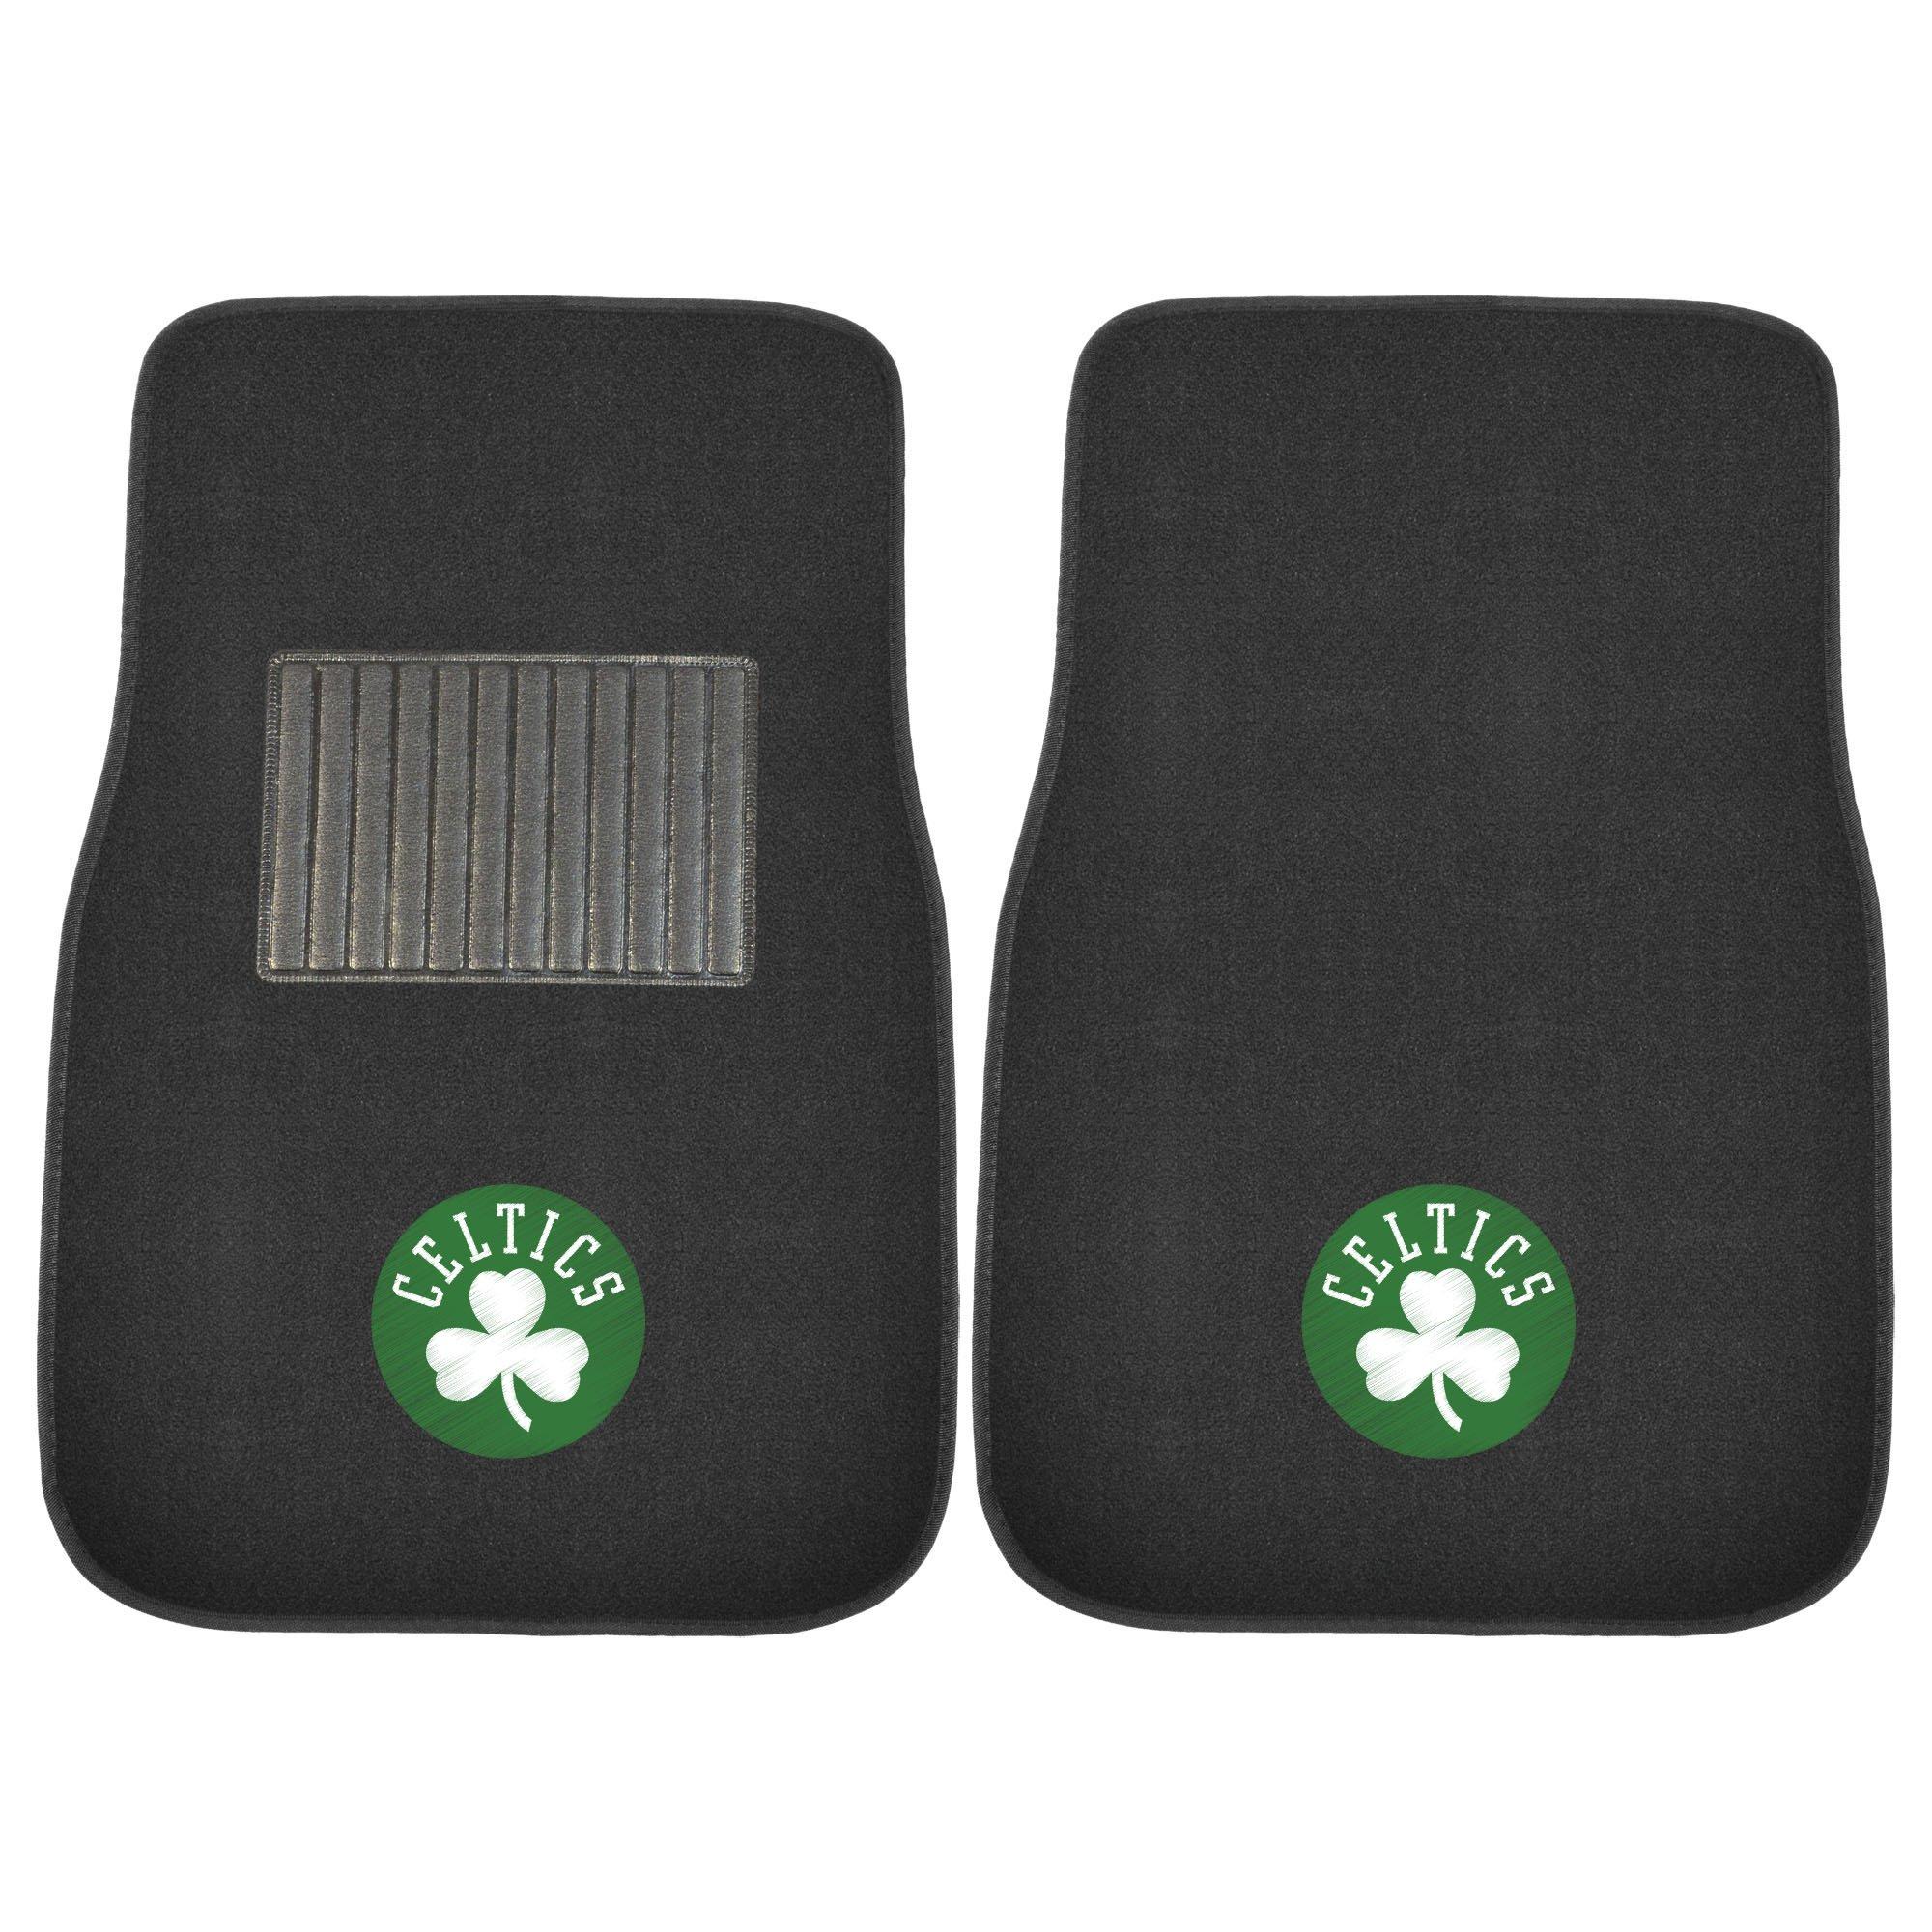 Fanmats 17611 NBA Boston Celtics 2-Piece Embroidered Car Mat